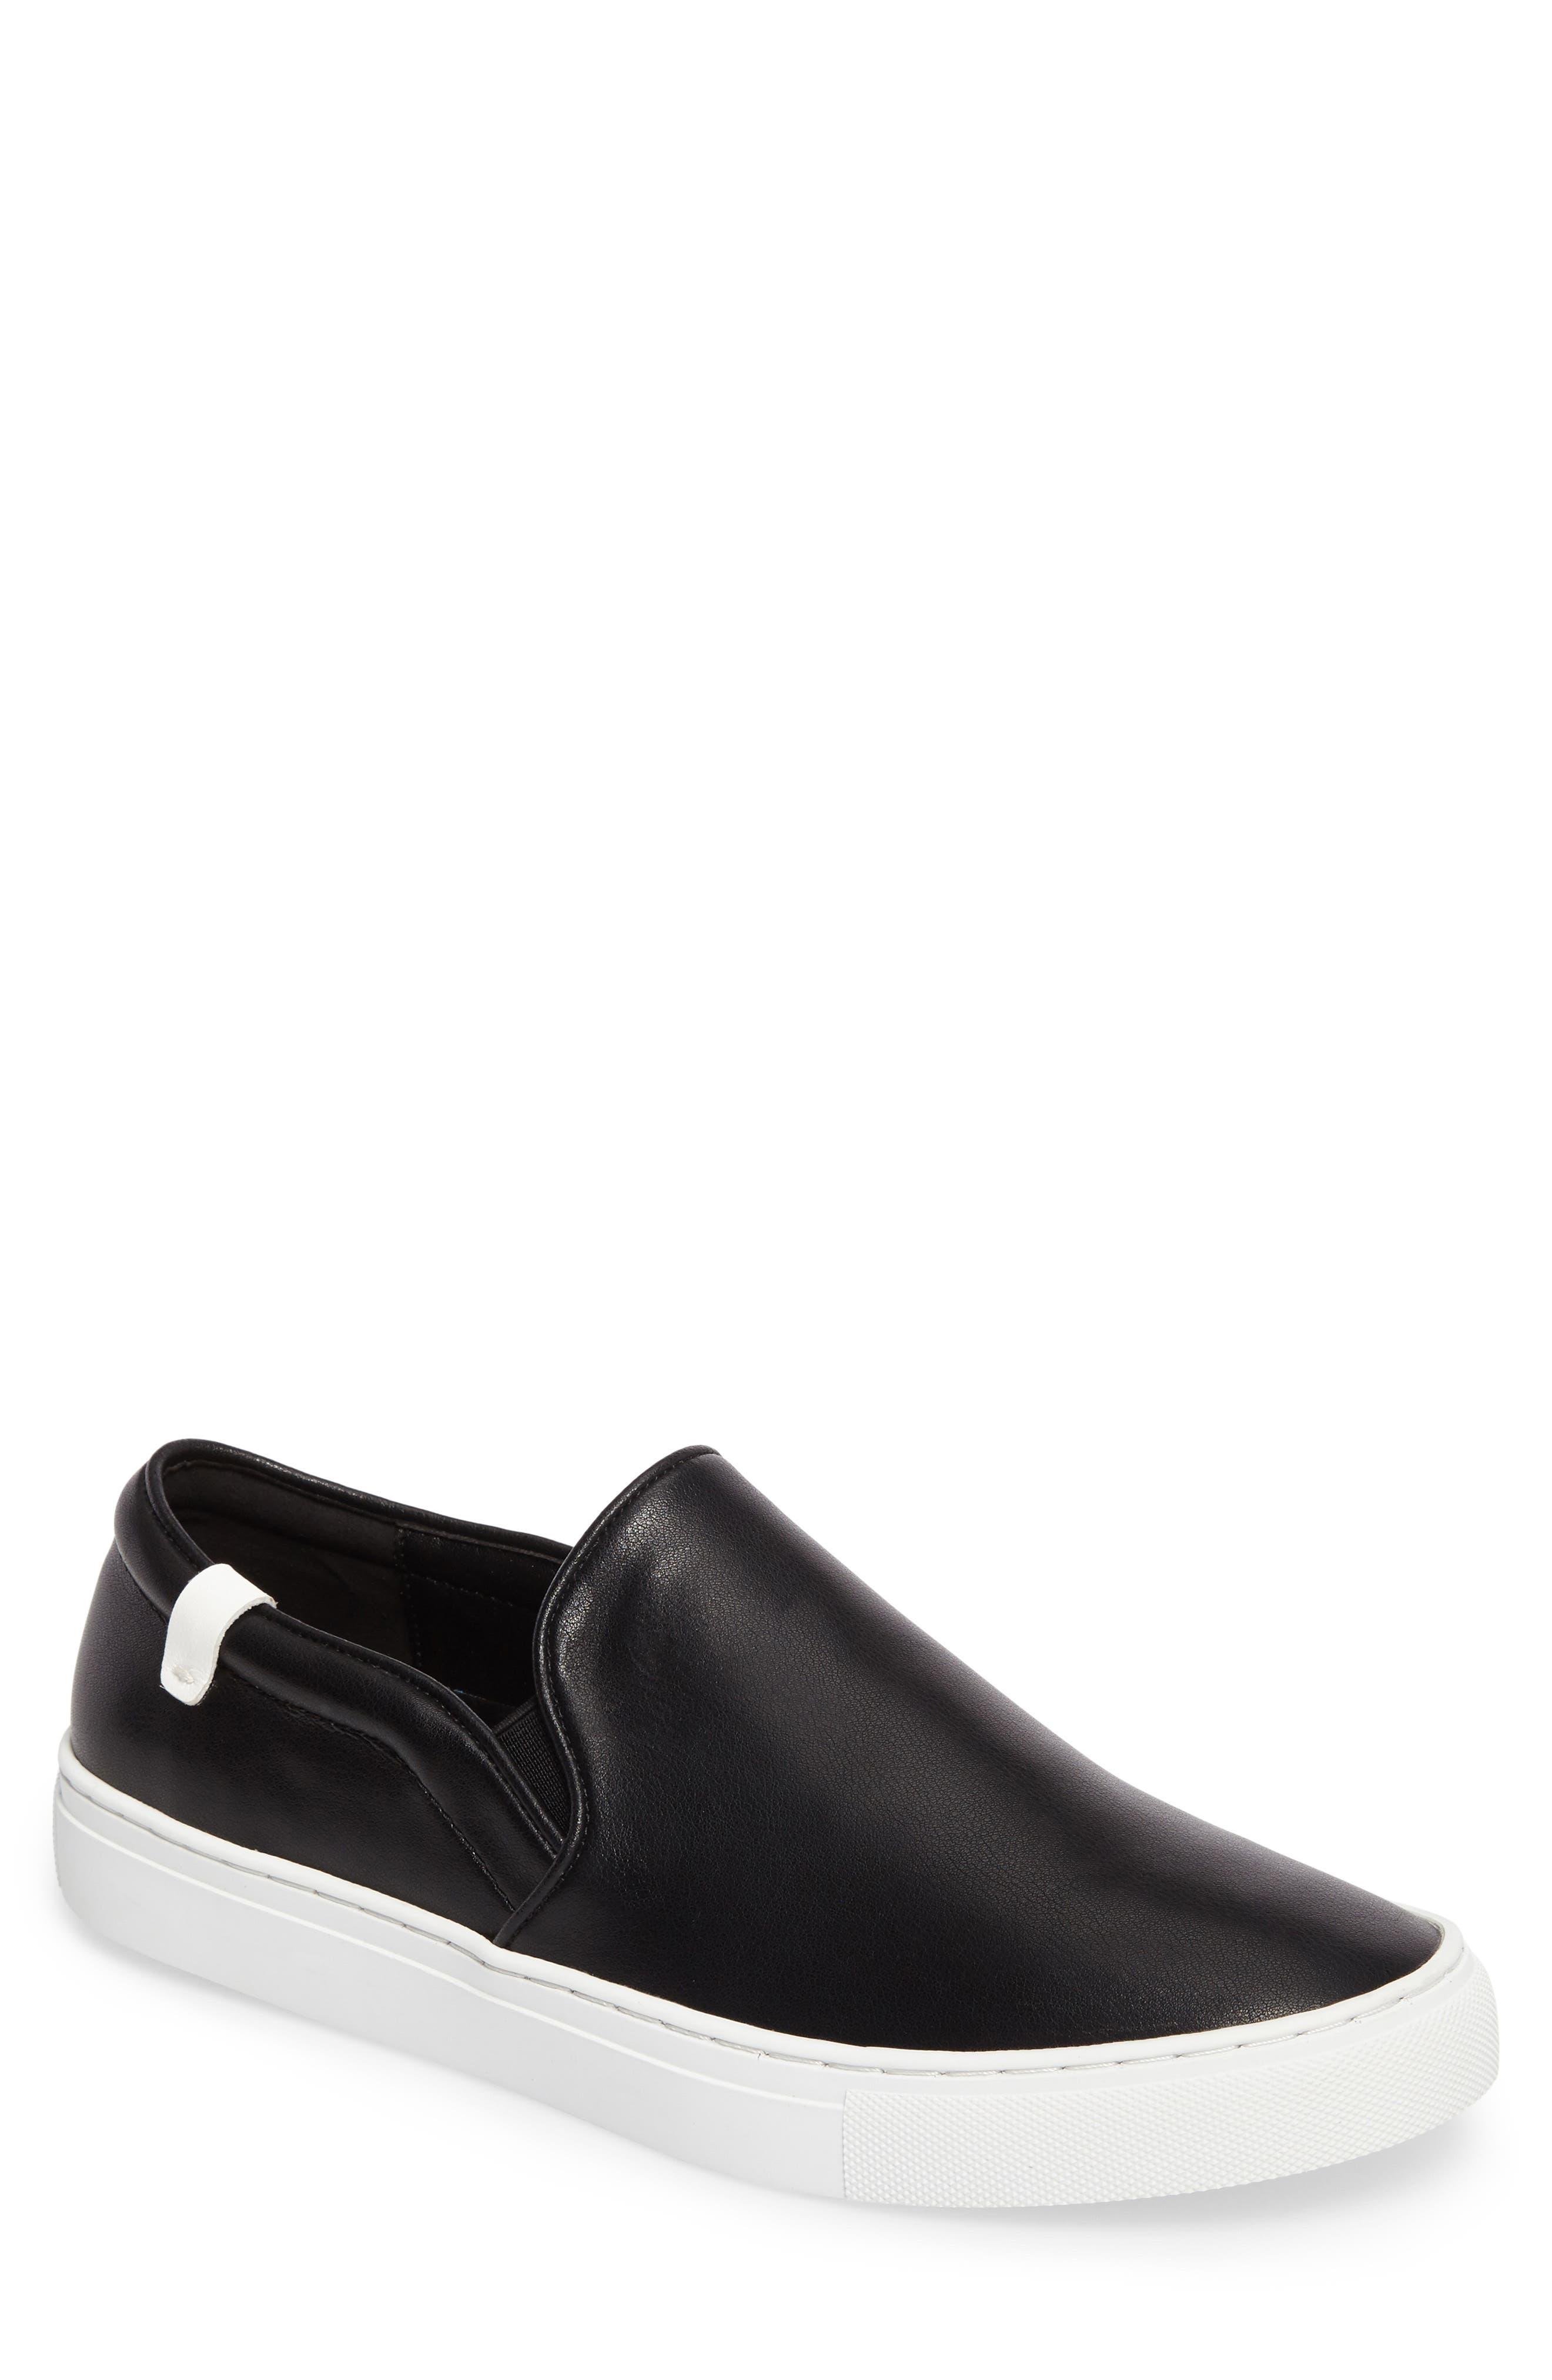 Main Image - House of Future Original Slip-On Sneaker (Men)